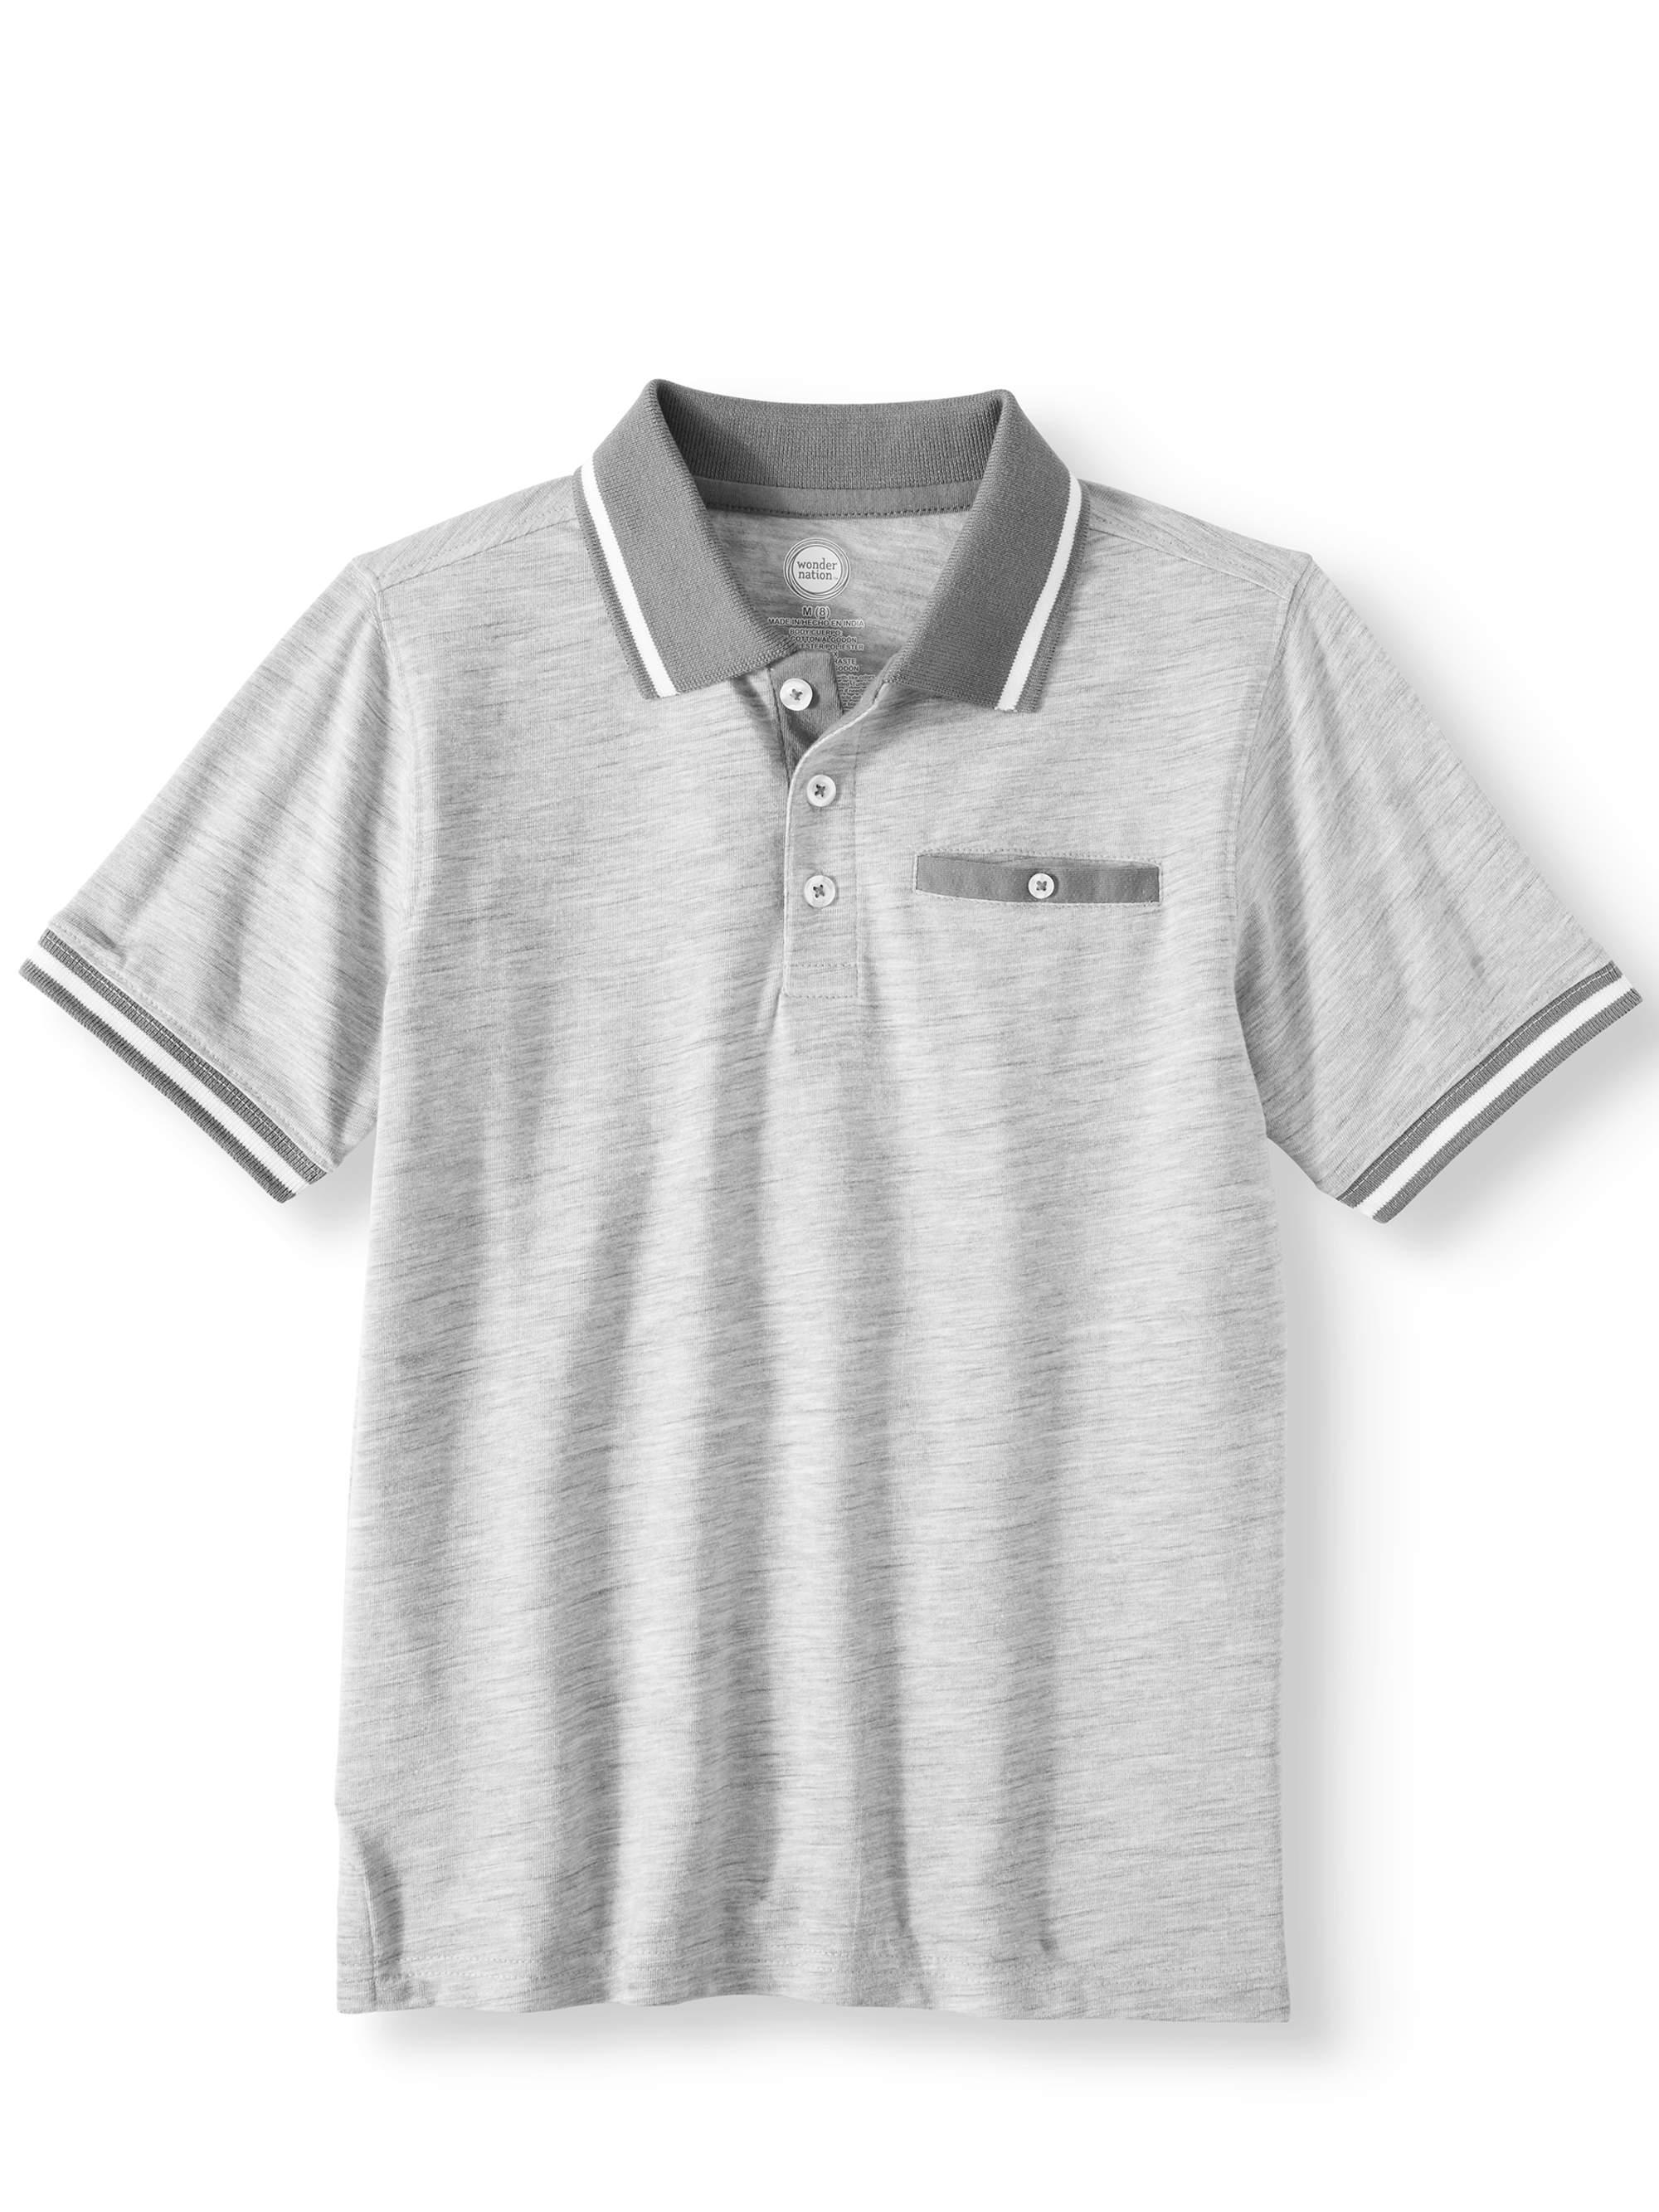 Short Sleeve Stretch Jersey Polo (Little Boys & Big Boys)